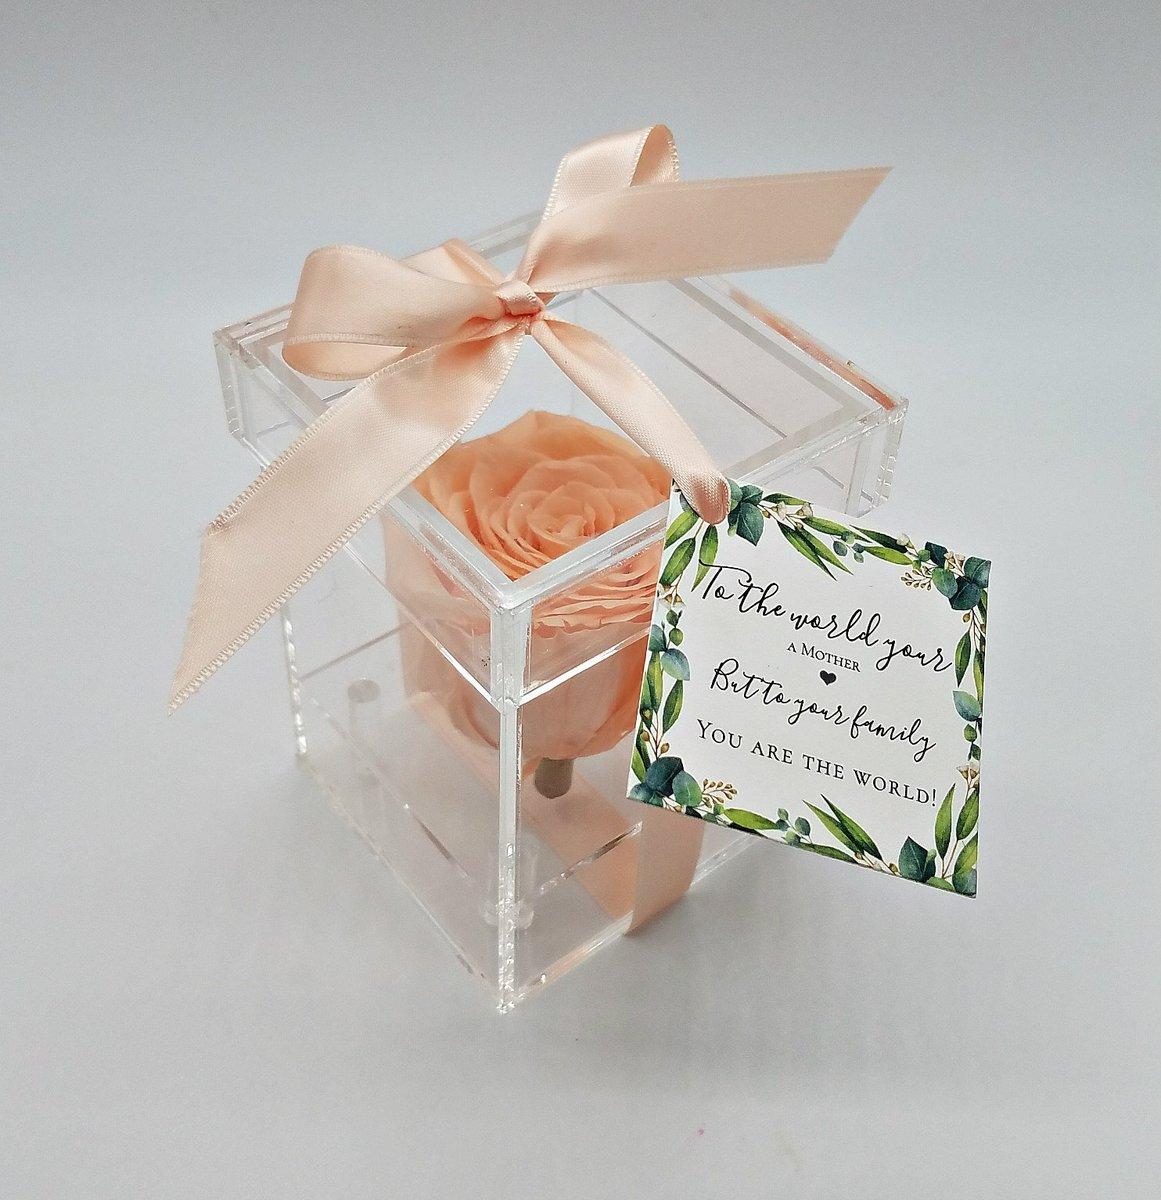 Excited to share the latest addition to my #etsy shop: Sympathy gift for loved ones - Single preserved rose in acrylic box https://etsy.me/3fvFF0q #griefmourning #singlerosebox #thoughtfulgift #friendgift #sympathygift #smallgiftidea #lossoflovedone #deathoflovedone #lpic.twitter.com/xshazjwkp7